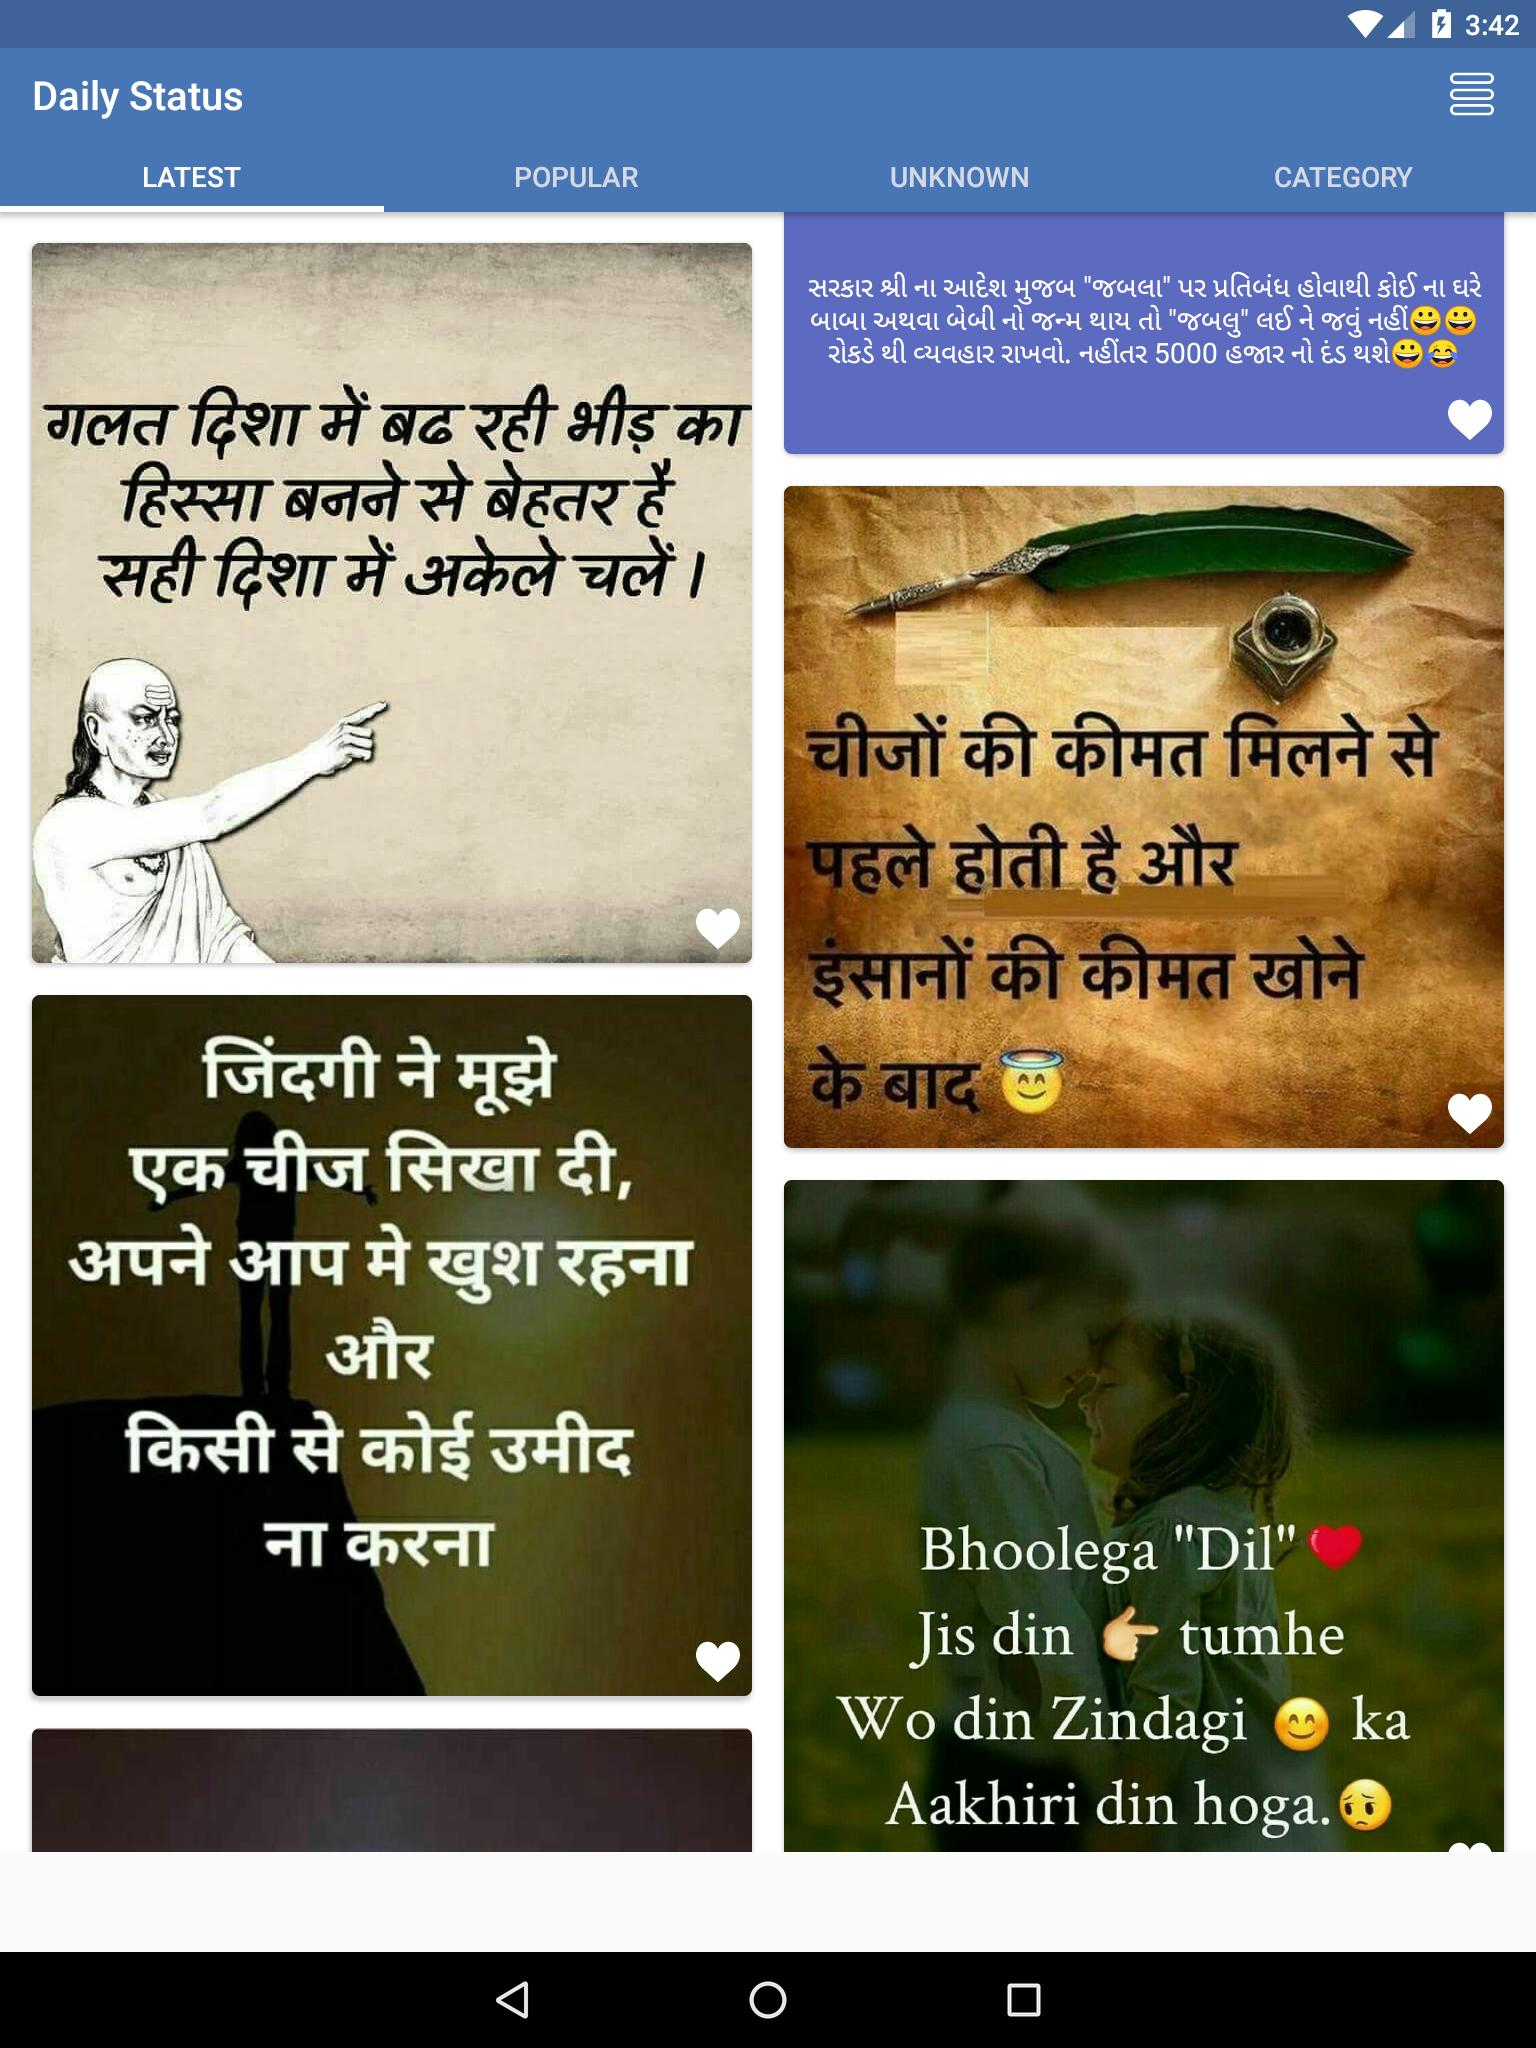 WhatsApp Status Video, DP Status, Attitude Status for